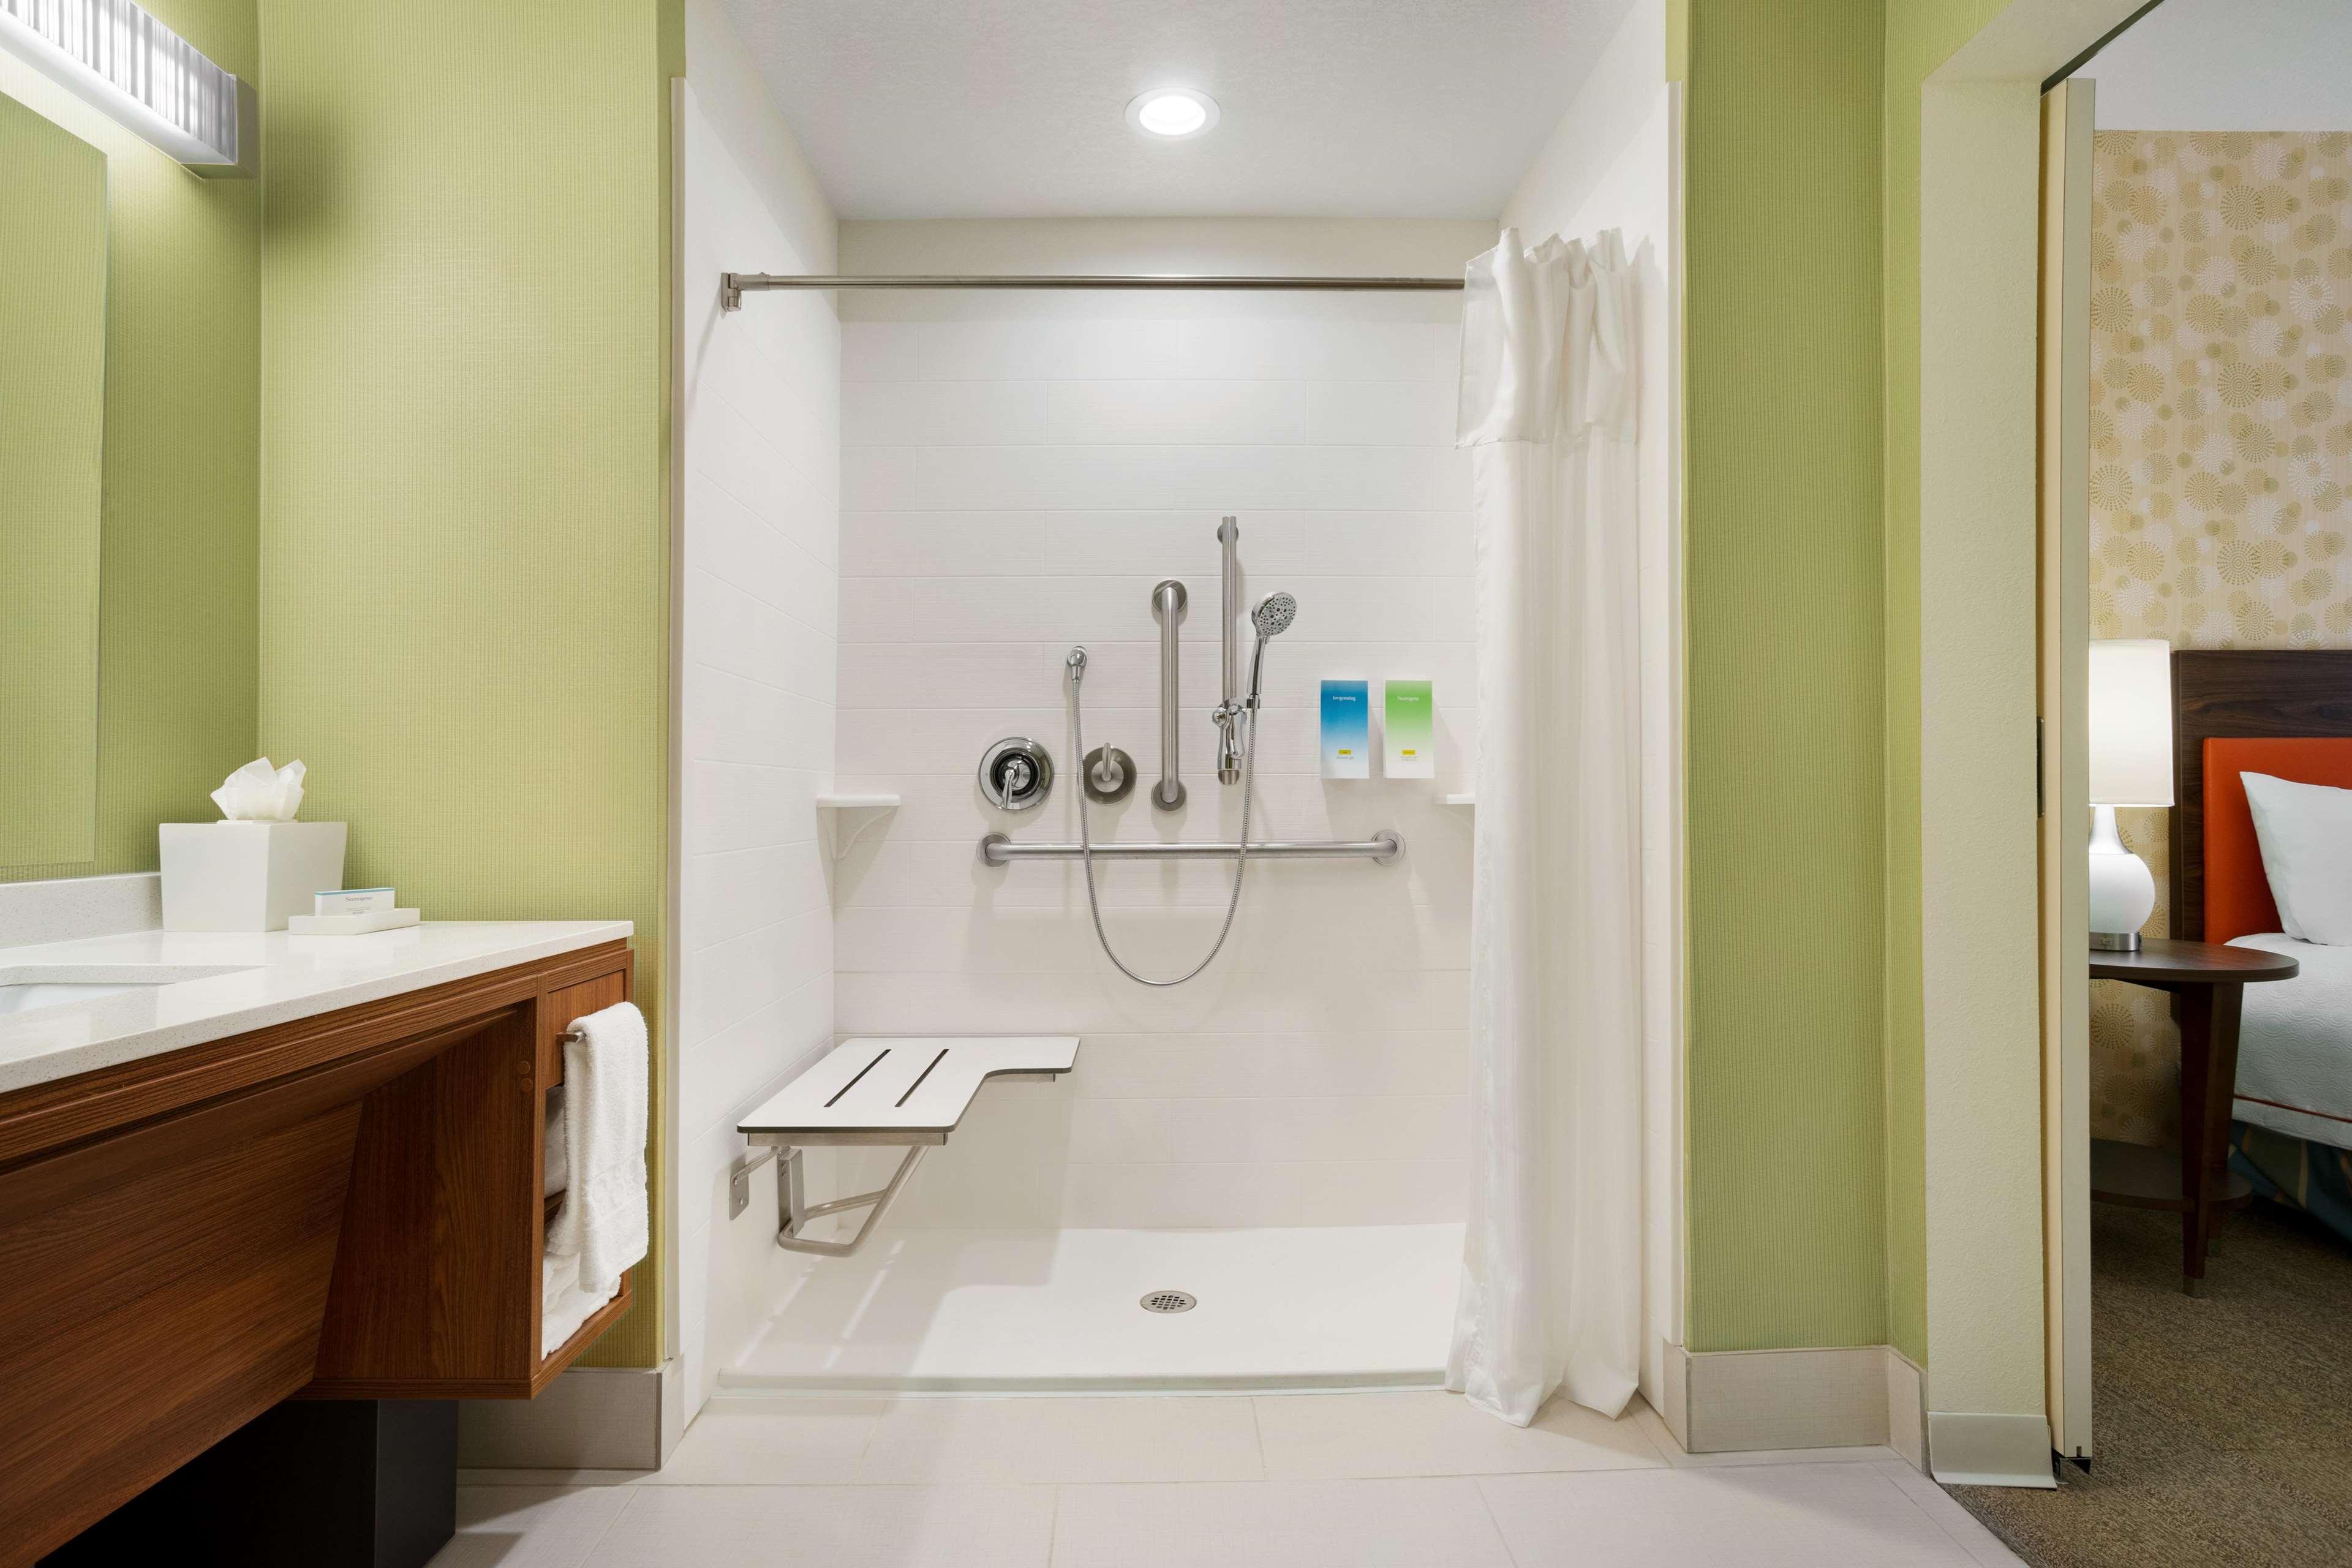 Home2 Suites by Hilton Elko image 30